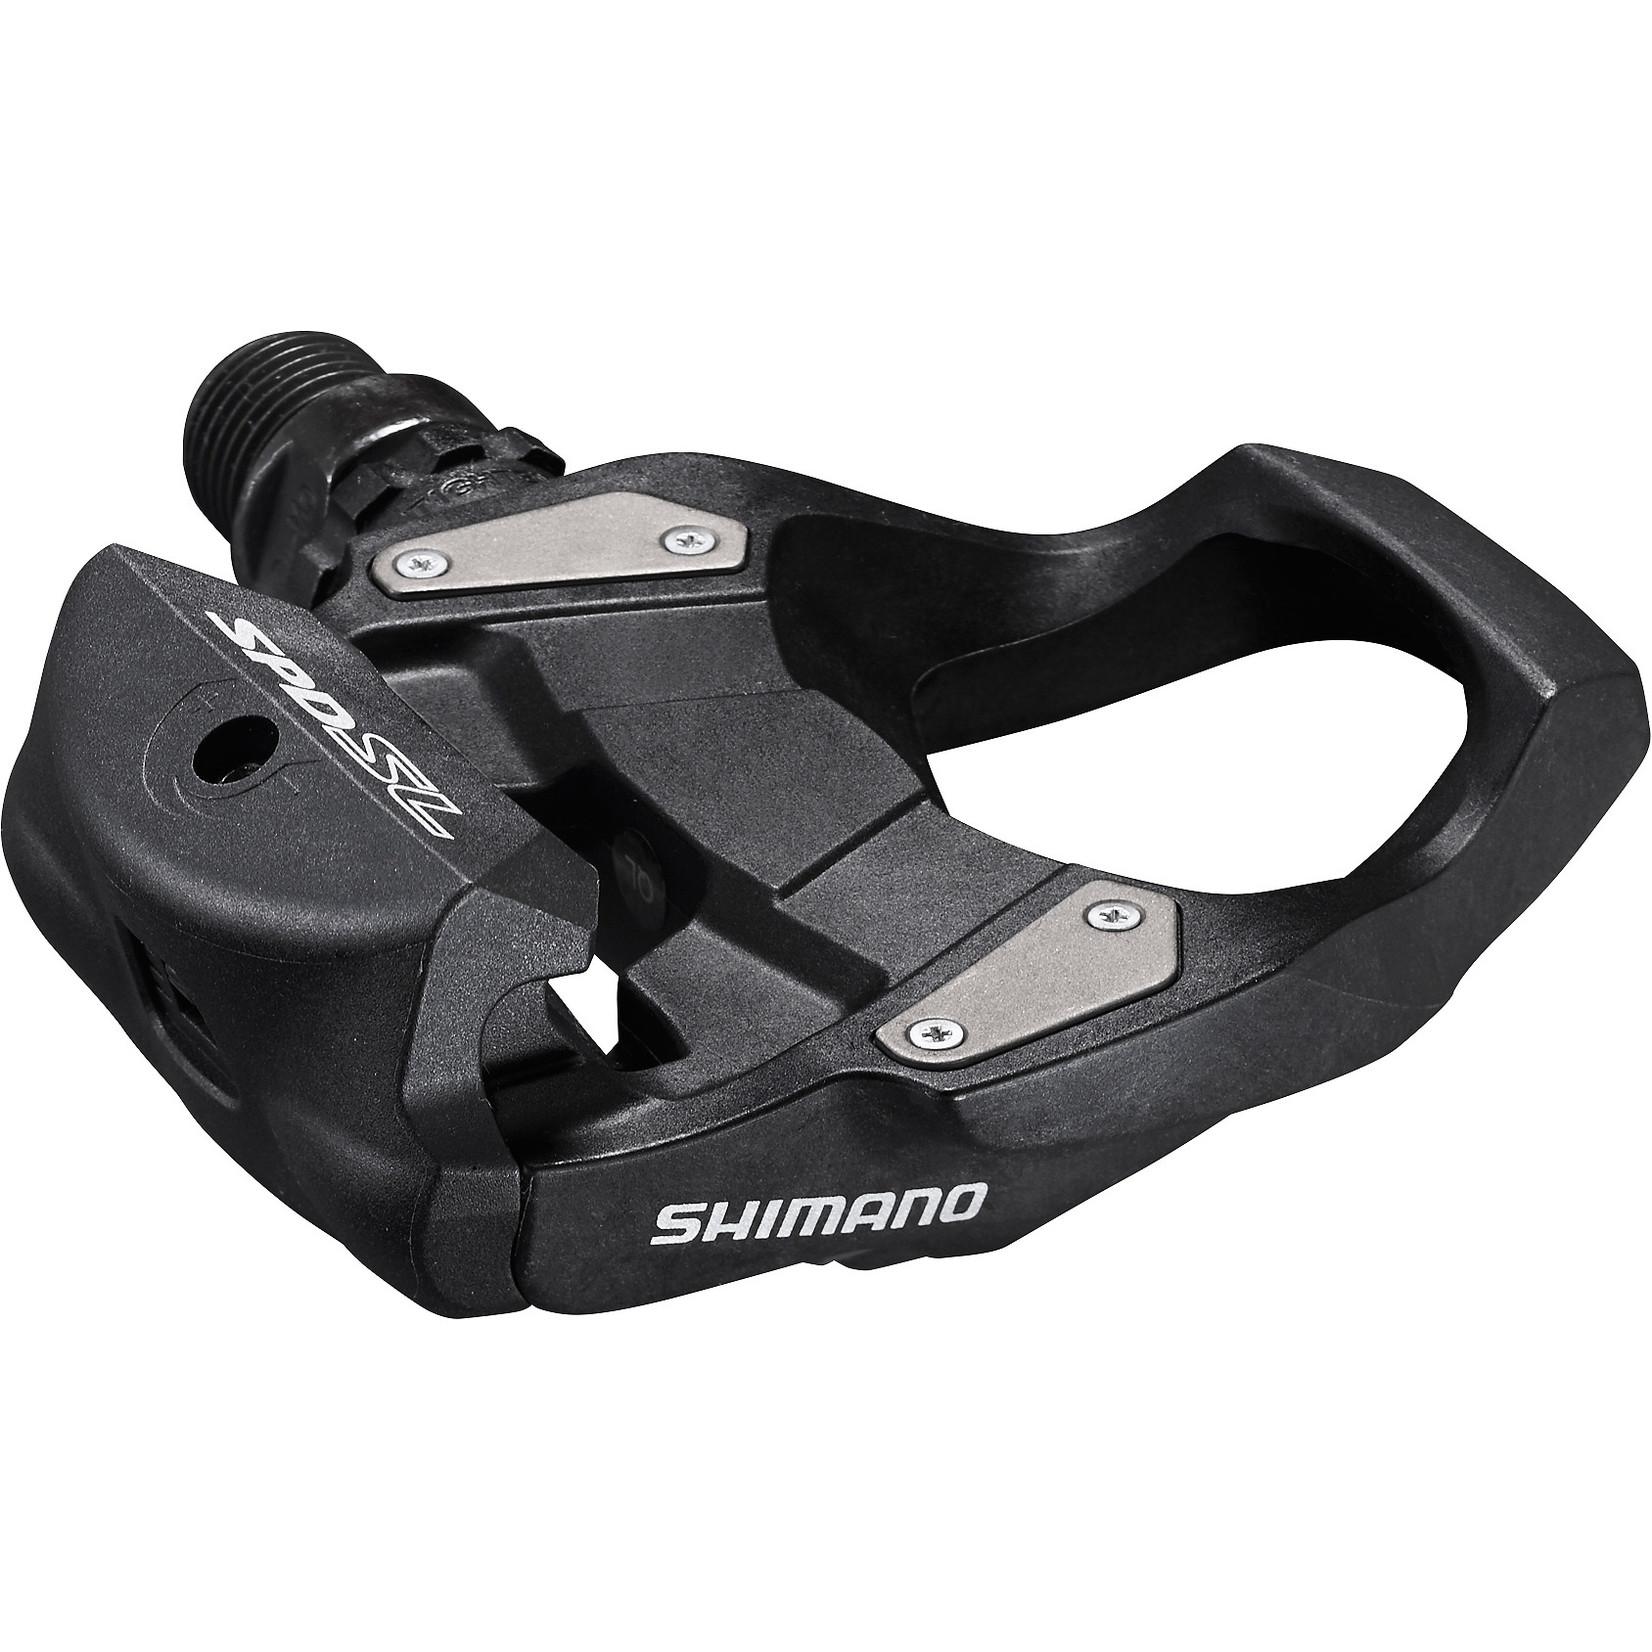 Shimano PD-RS500 SPD-SL pedal, black